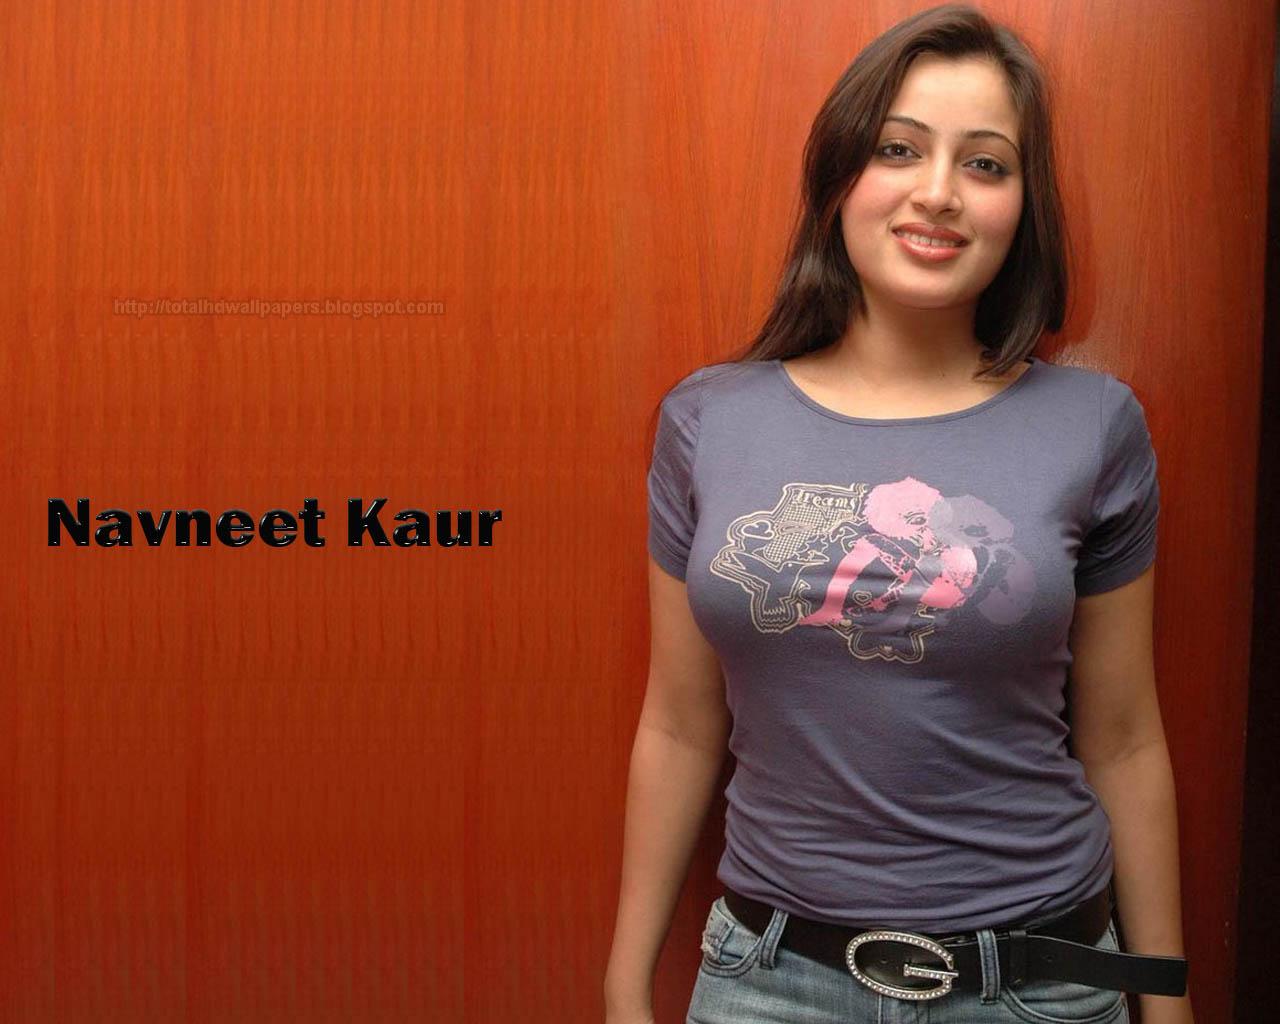 Beautiful Indian Girl Hd Wallpapers 1080p Bollywood Actress Hd Wallpapers Hollywood Actress Hd